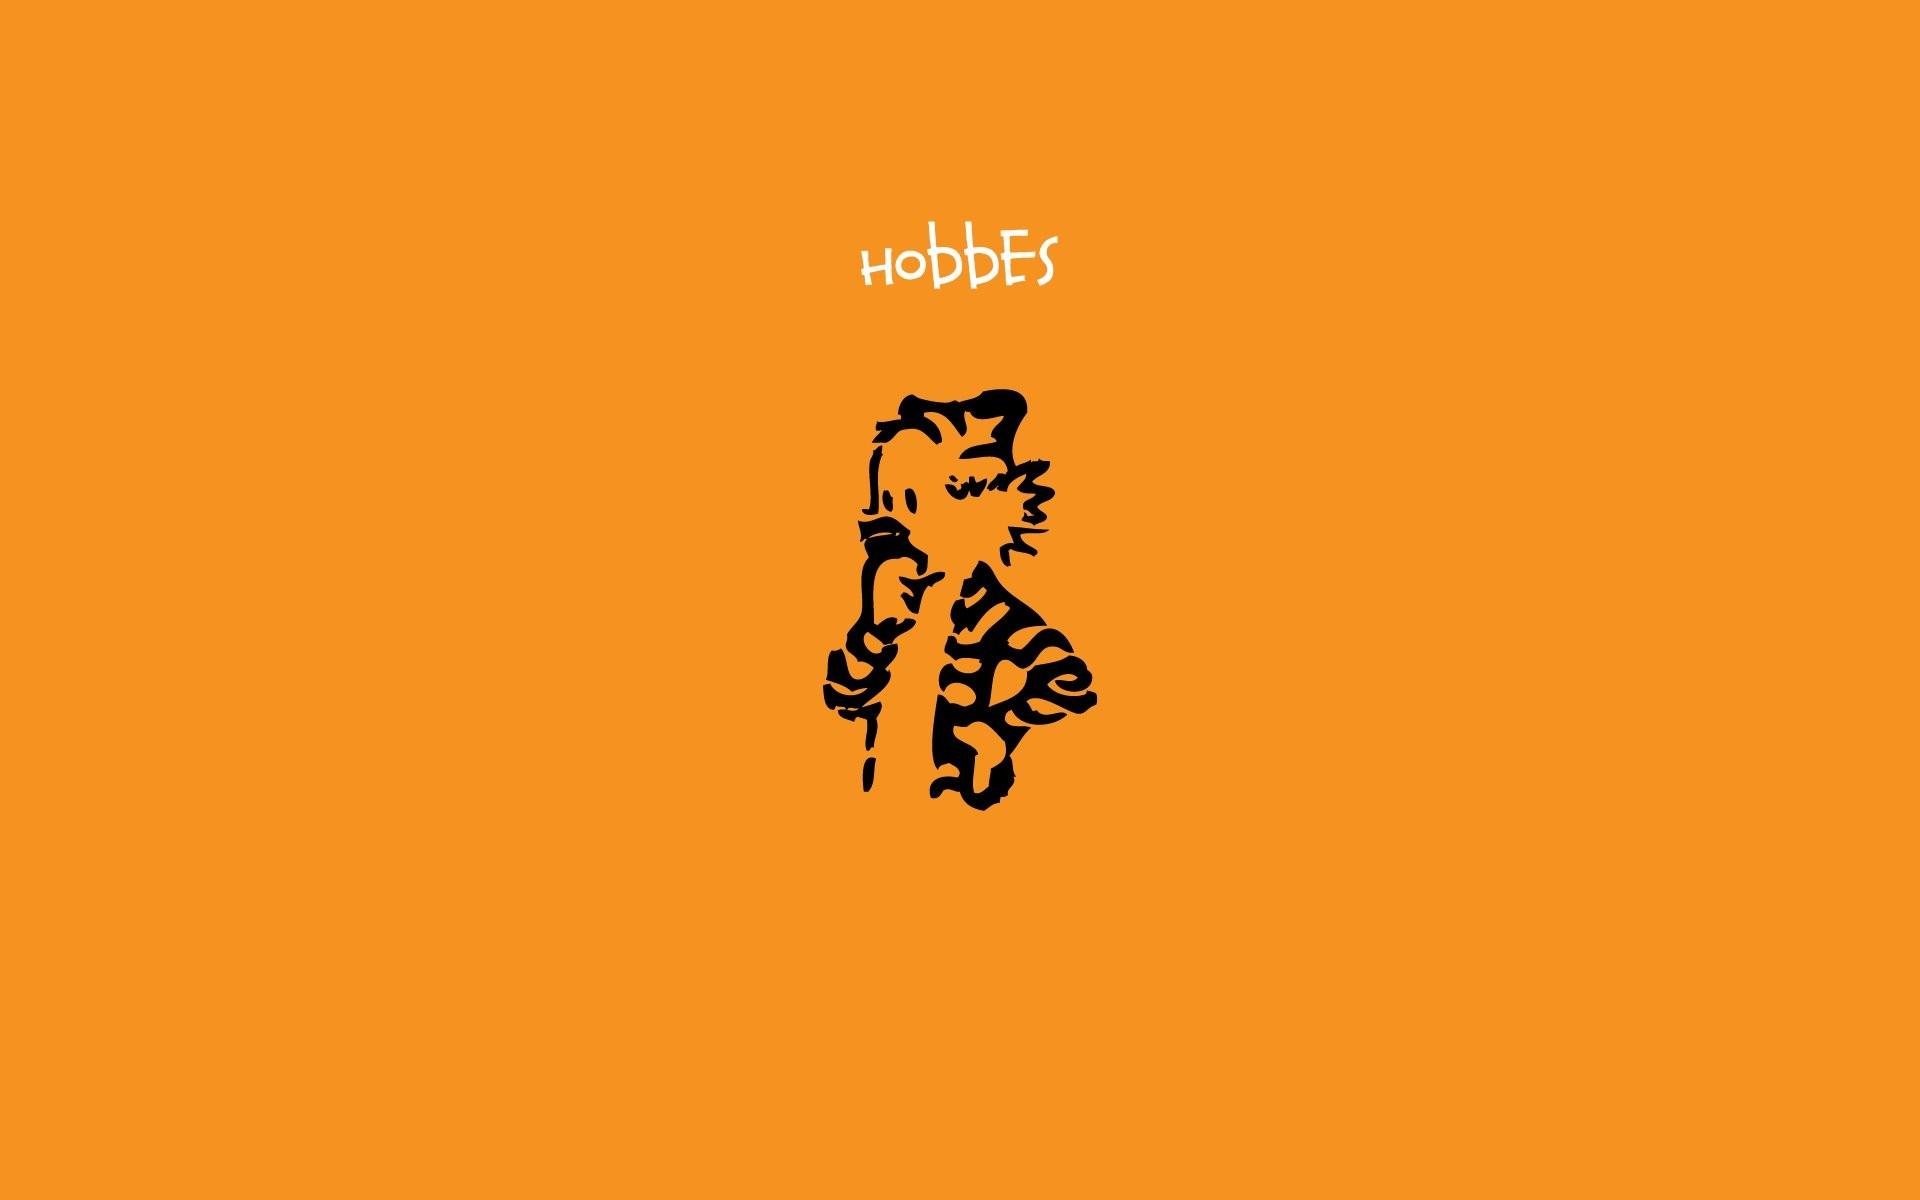 Comics – Calvin & Hobbes Hobbes (Calvin & Hobbes) Wallpaper